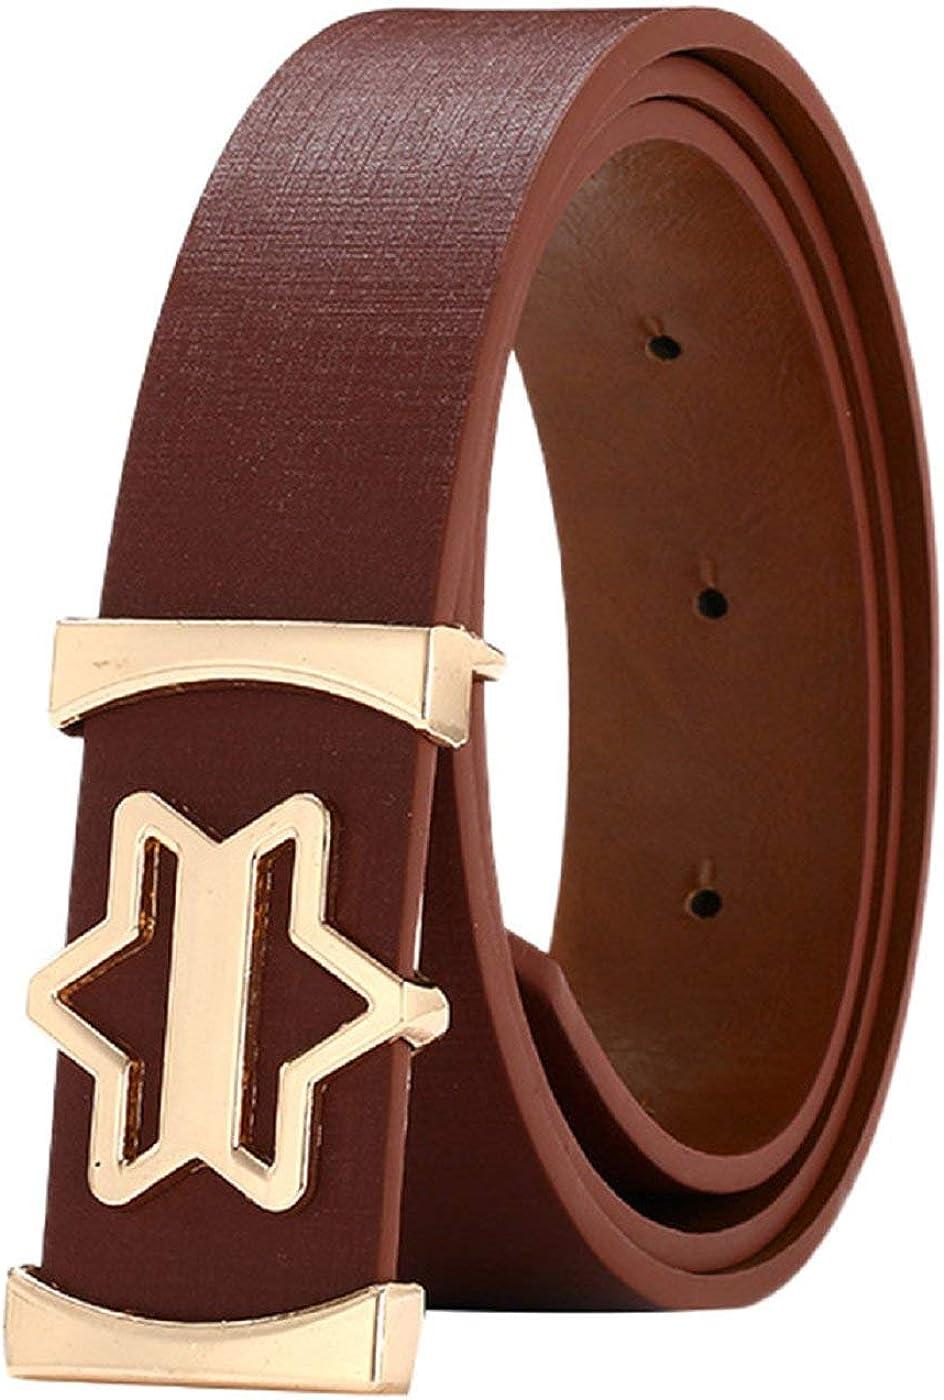 Barlingrock Belt Unisex Womens Smooth Wide Buckle Waist Wide Leather Belts